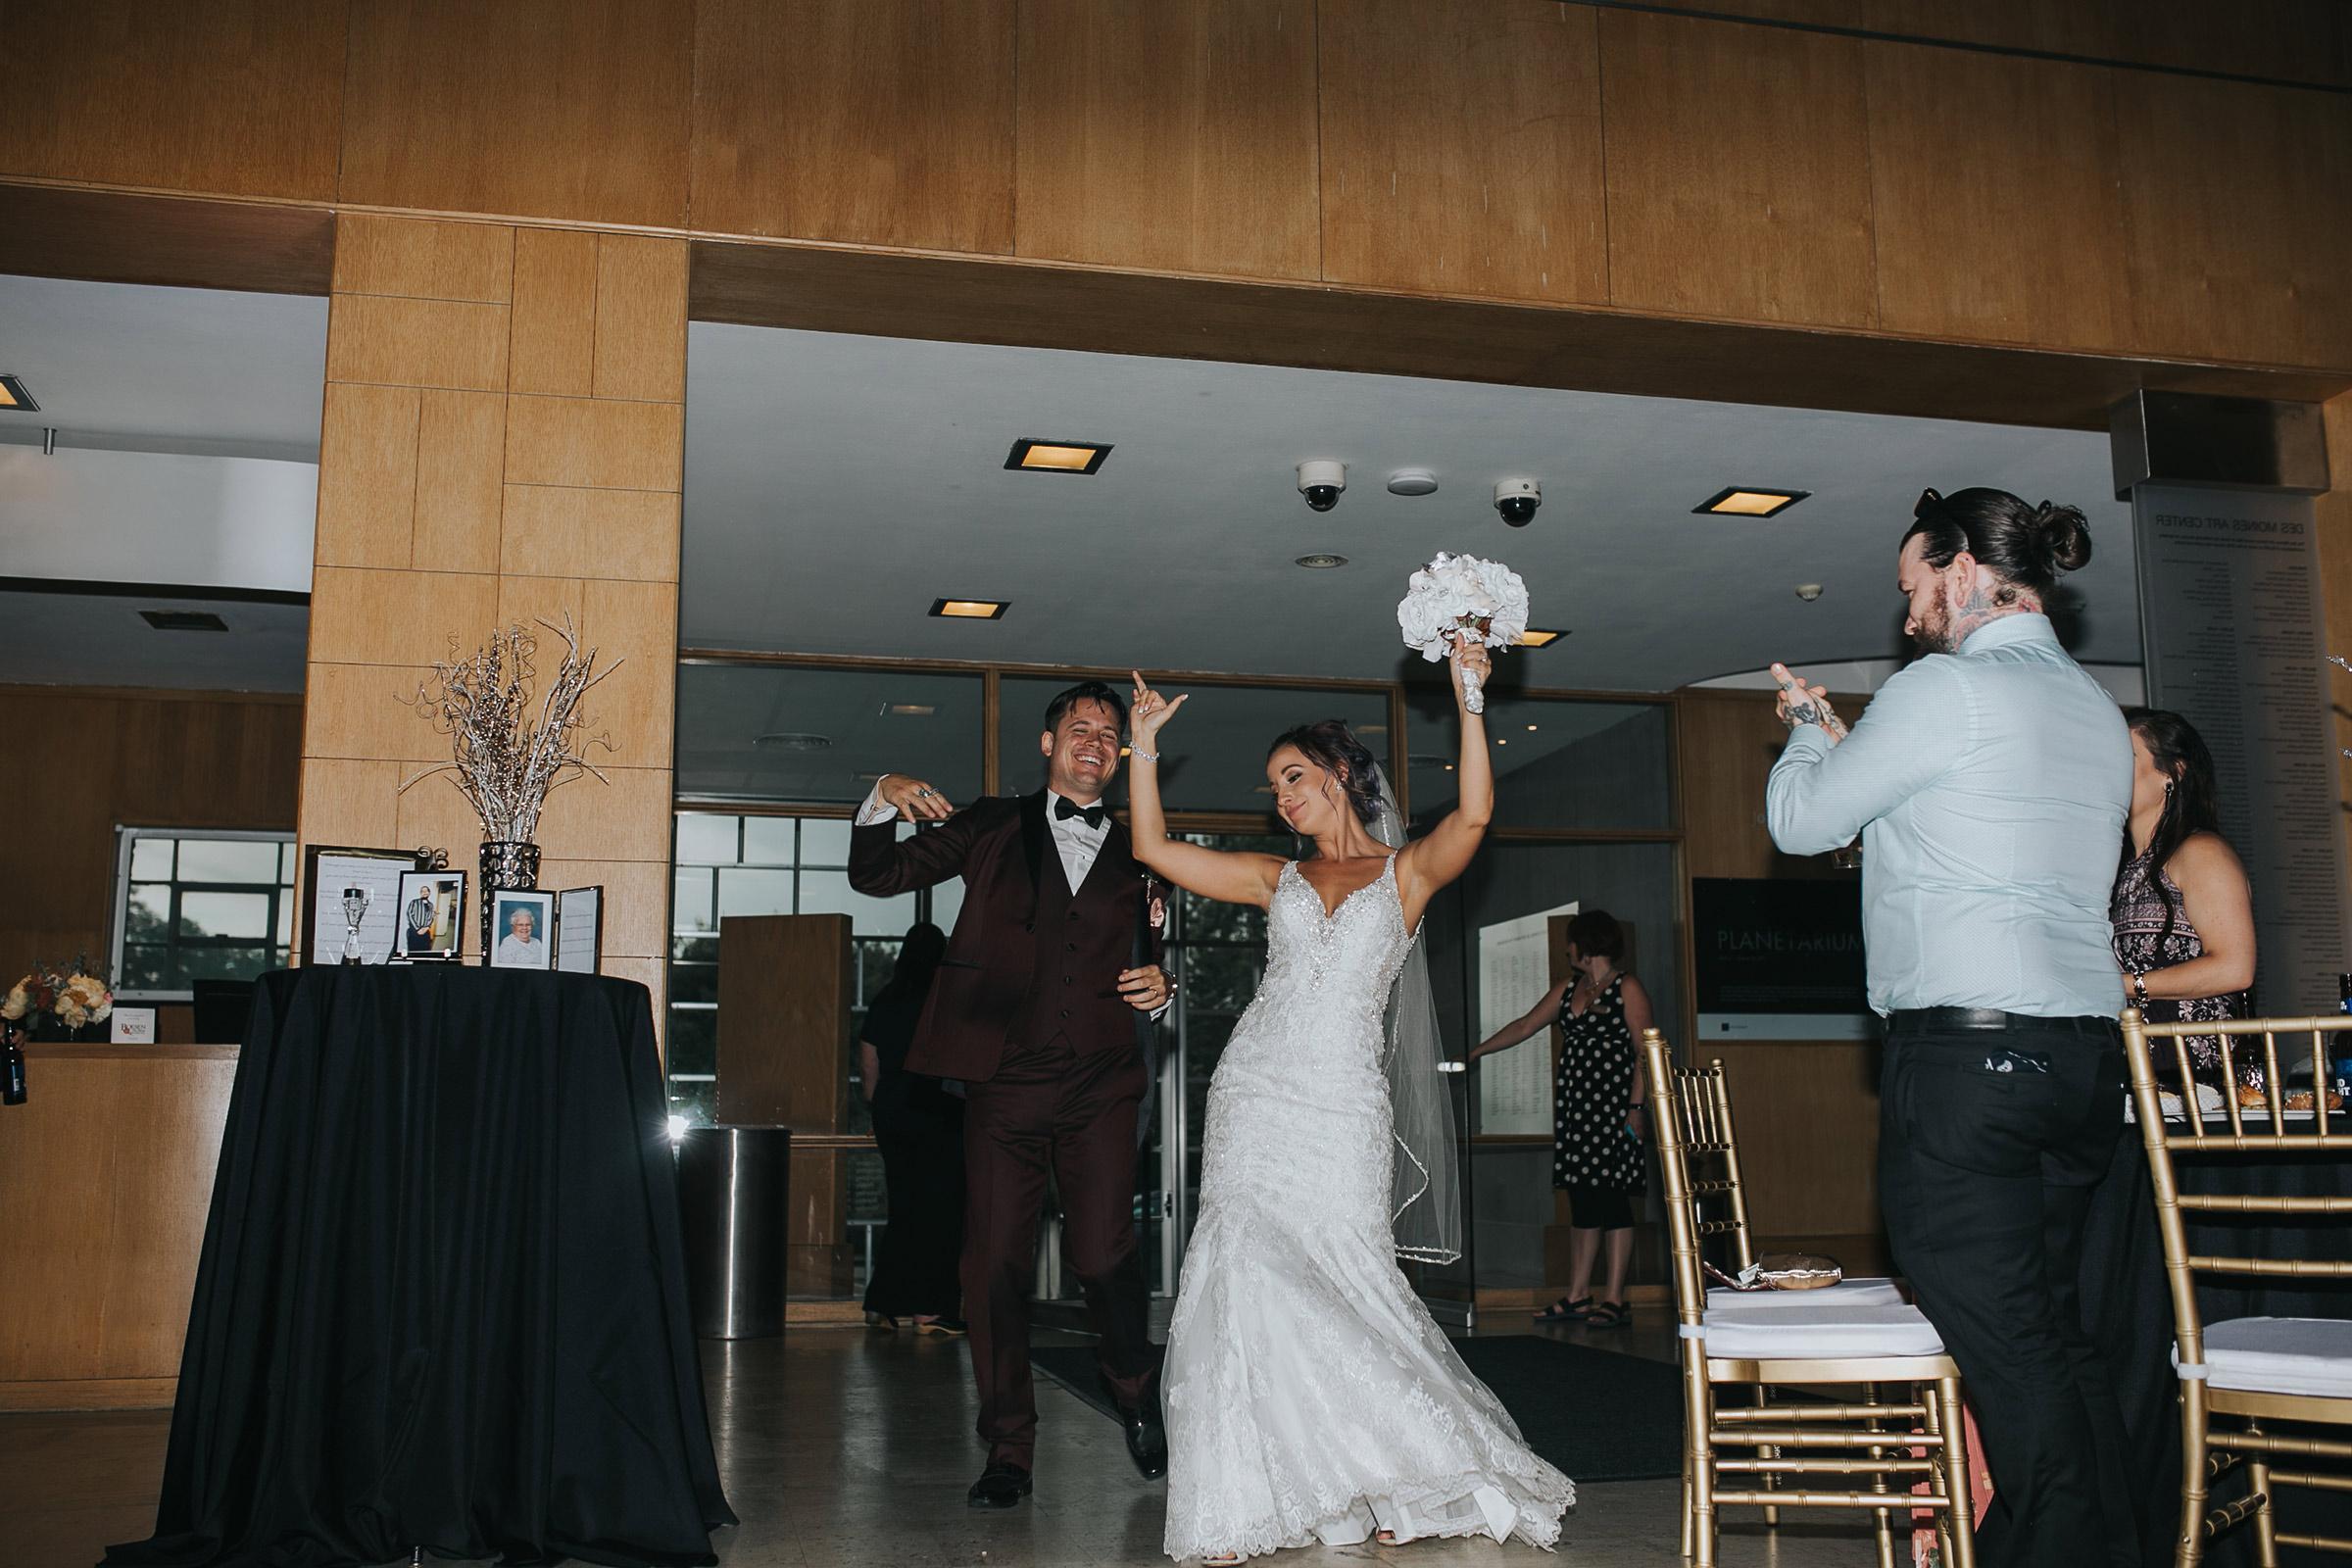 bride-and-groom-grand-enterance-desmoines-iowa-art-center-raelyn-ramey-photography.jpg